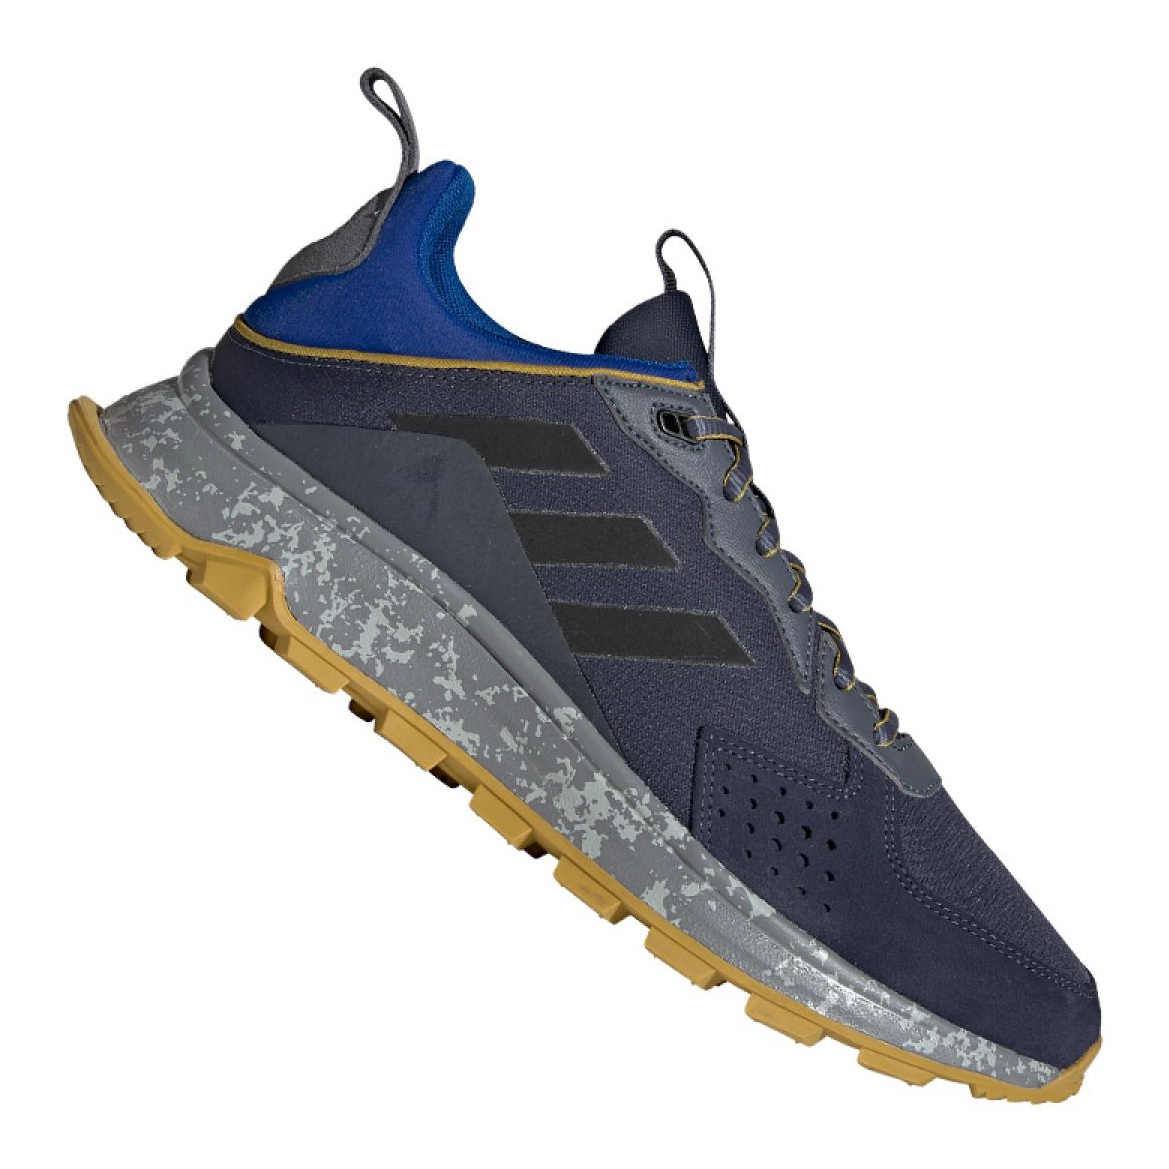 Tênis de corrida adidas Resopnse Trail M EE9829